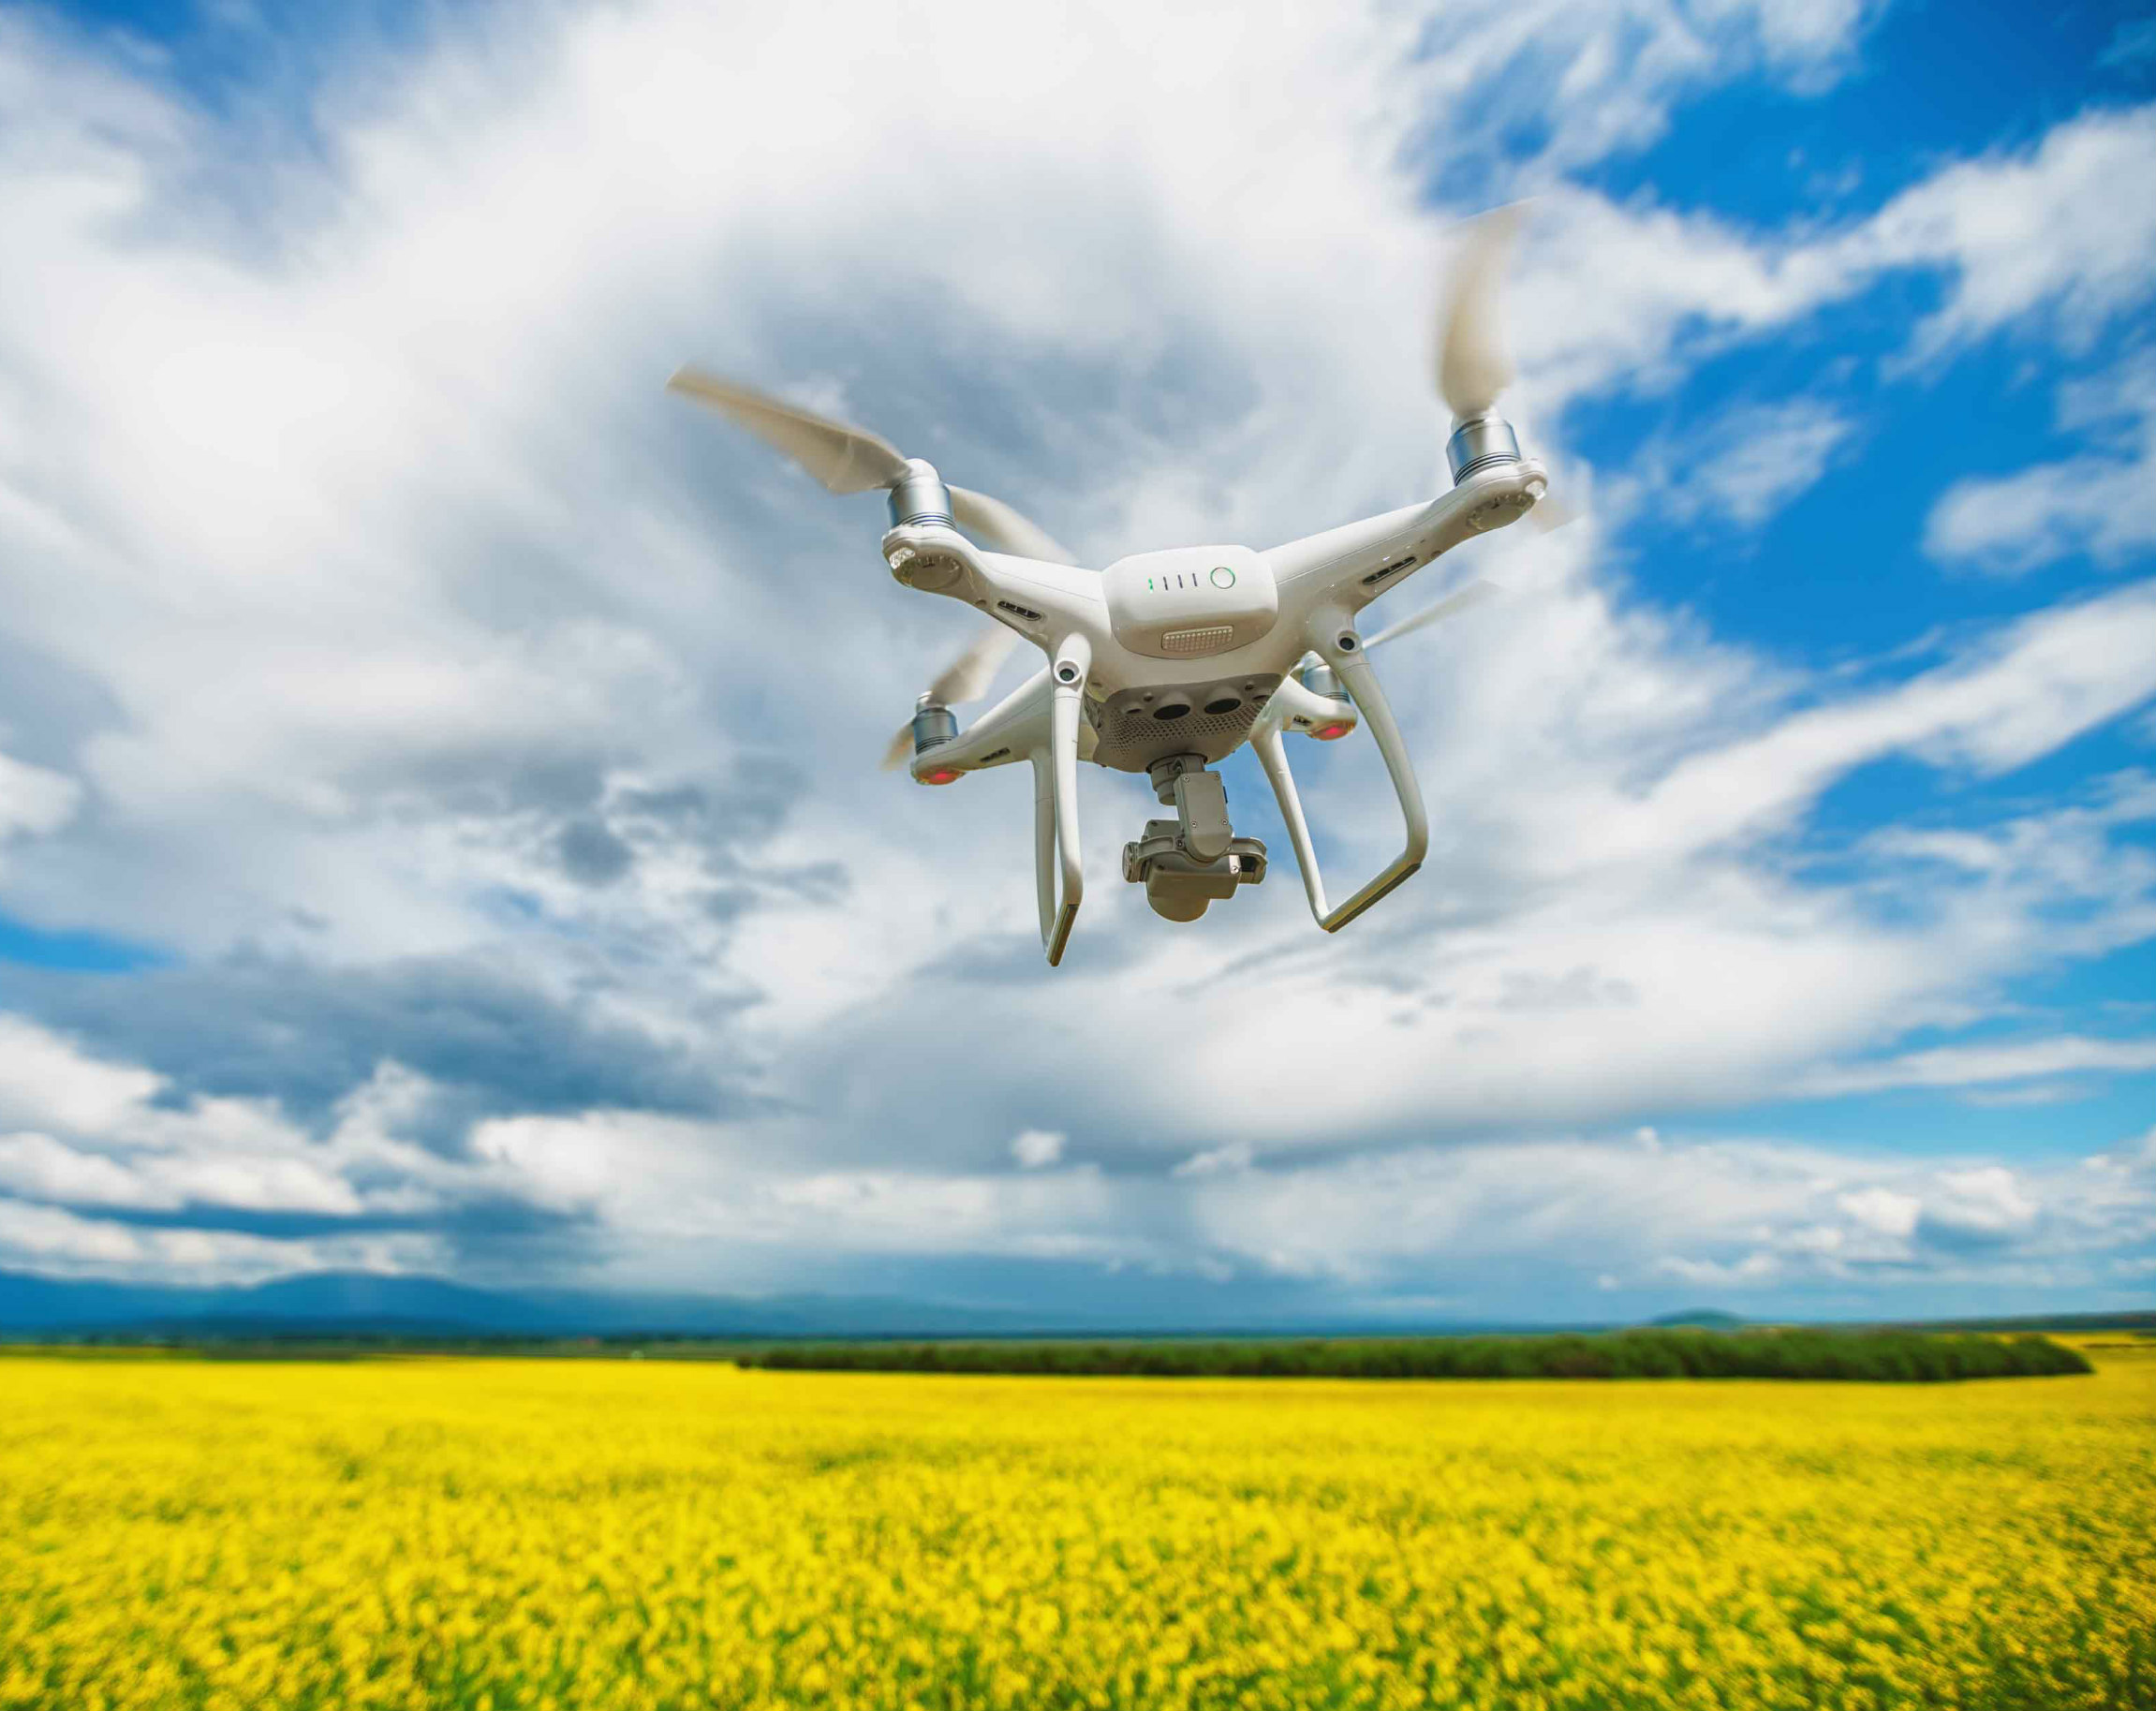 Robotics and precision agriculture